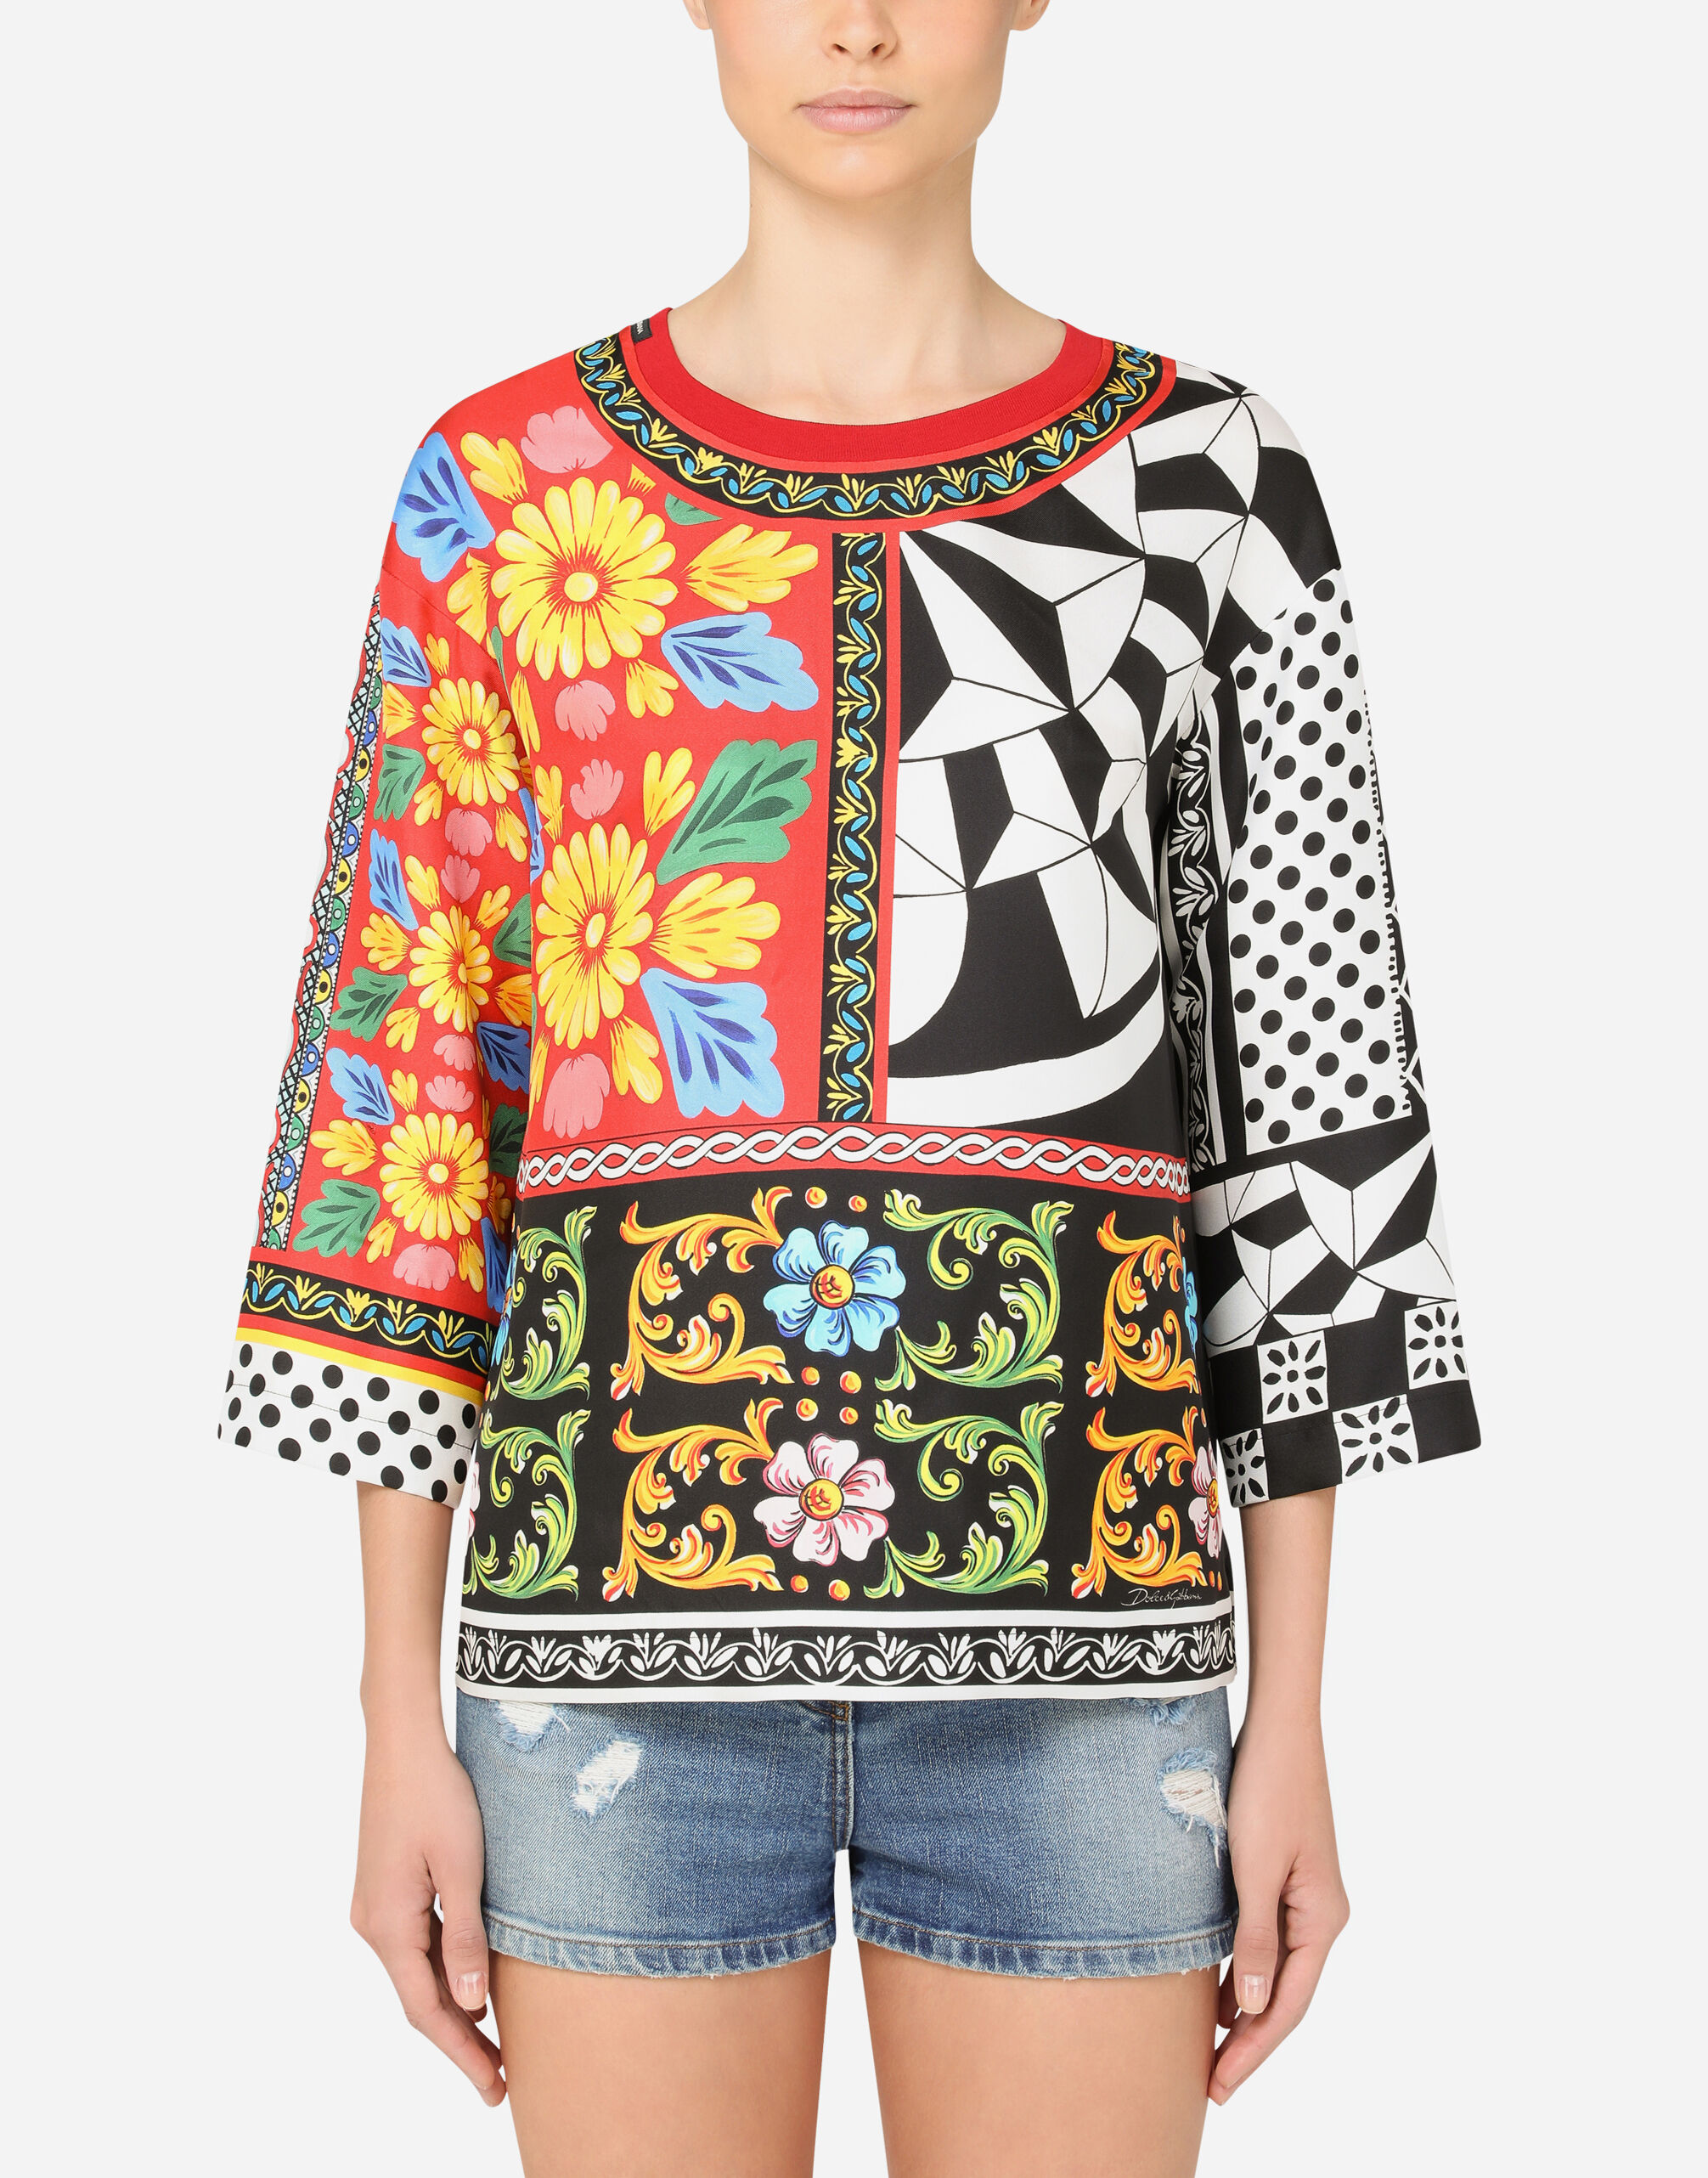 Blusa in twill stampa patchwork